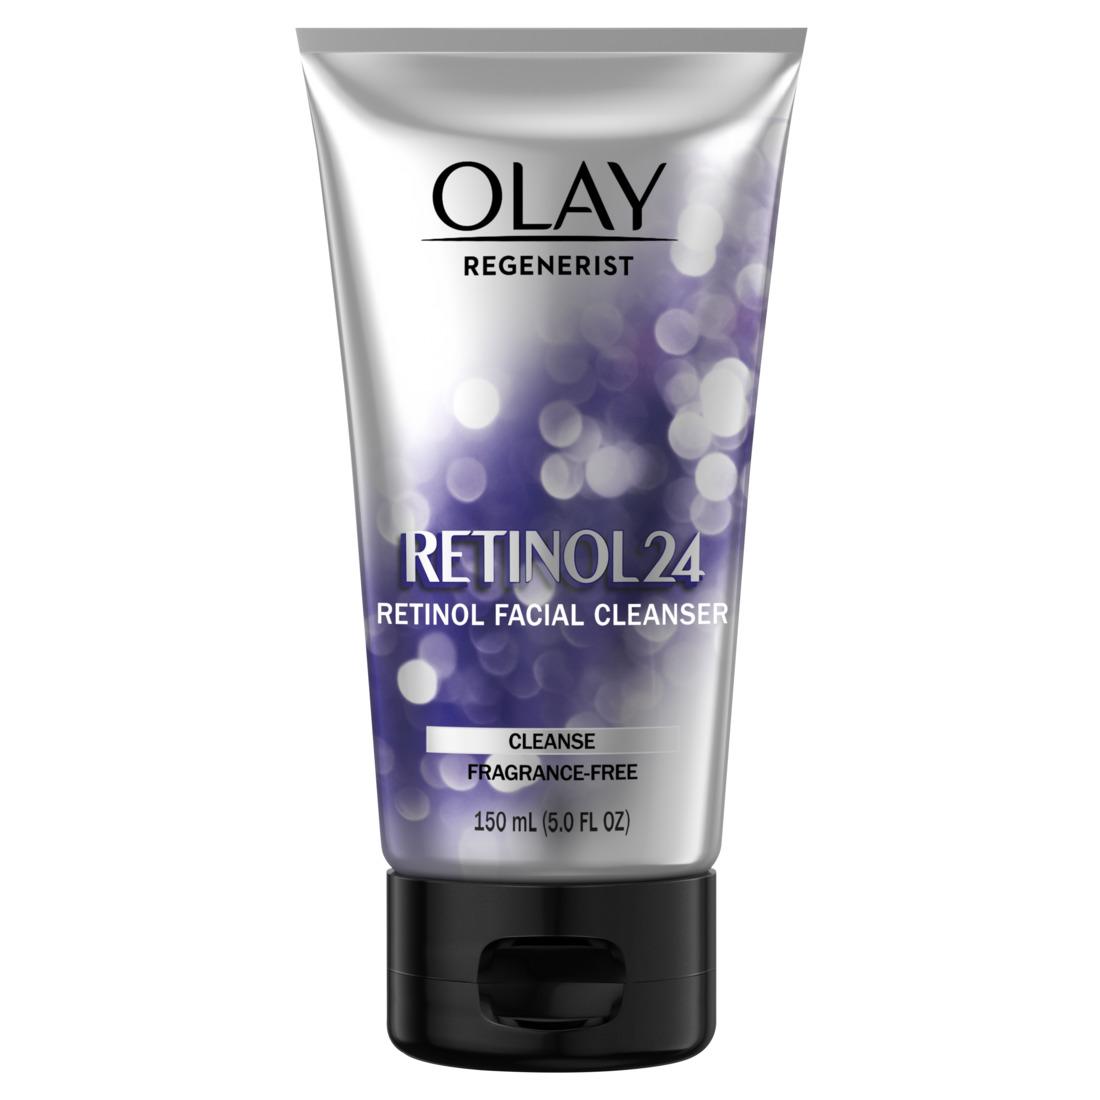 OLAY RETINOL 24 FACIAL CLEANSER (5 OZ)